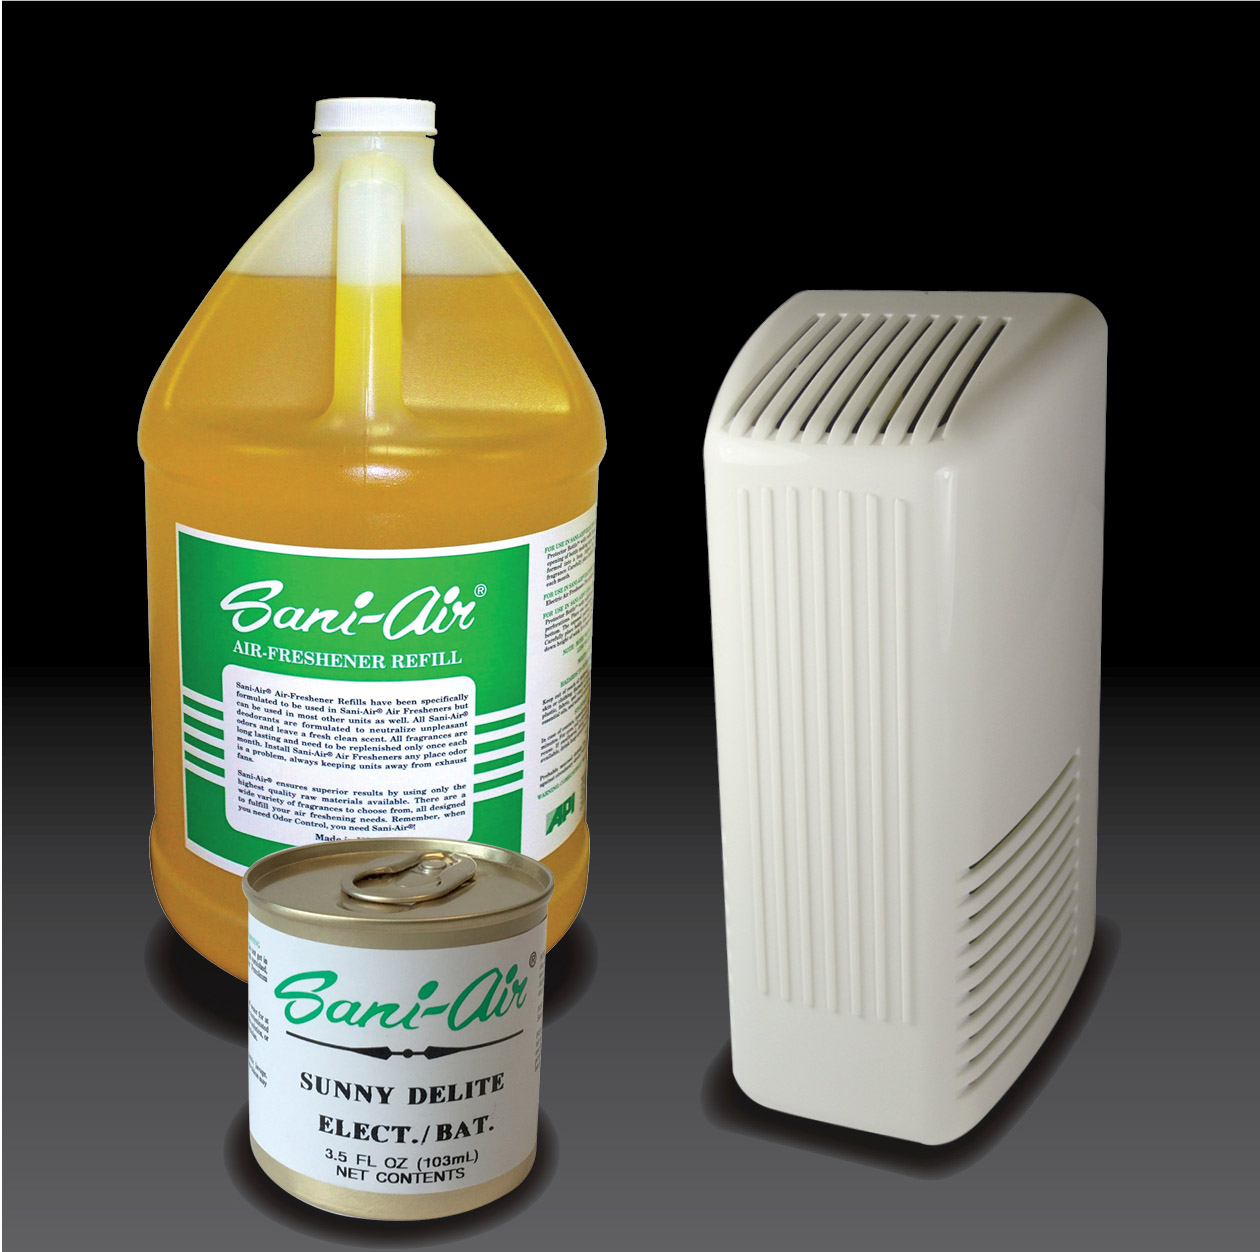 Our API-2000 Air Freshener Diffuser